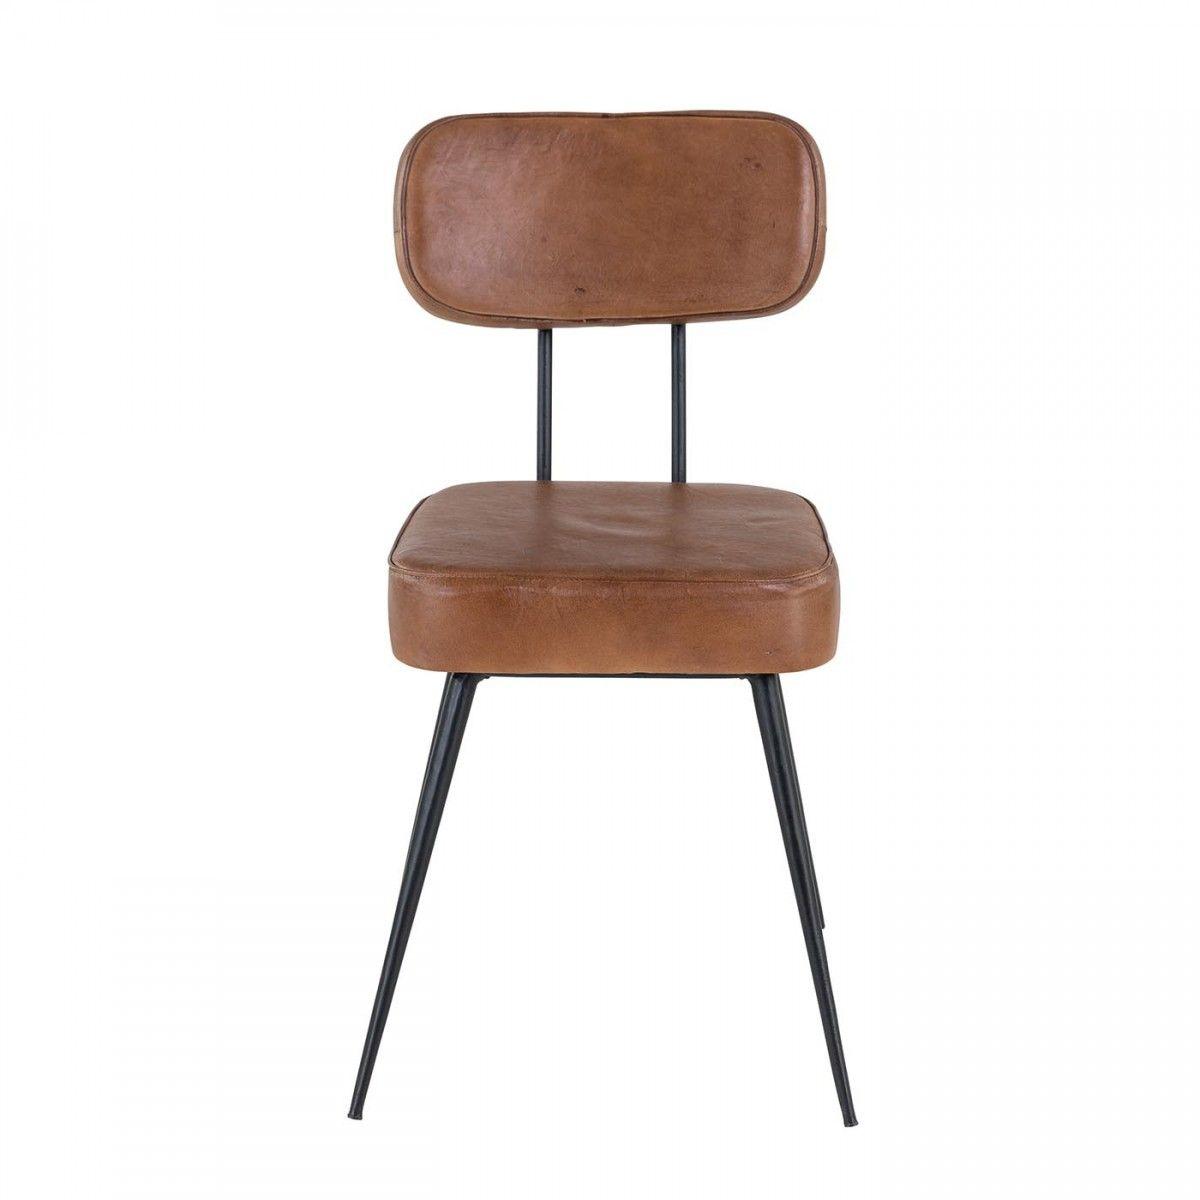 Chaise Style Industriel Cuir Et Metal Marron Bela Lot De 4 Chaise Cuir Marron Chaise Style Industriel Chaise Cuir